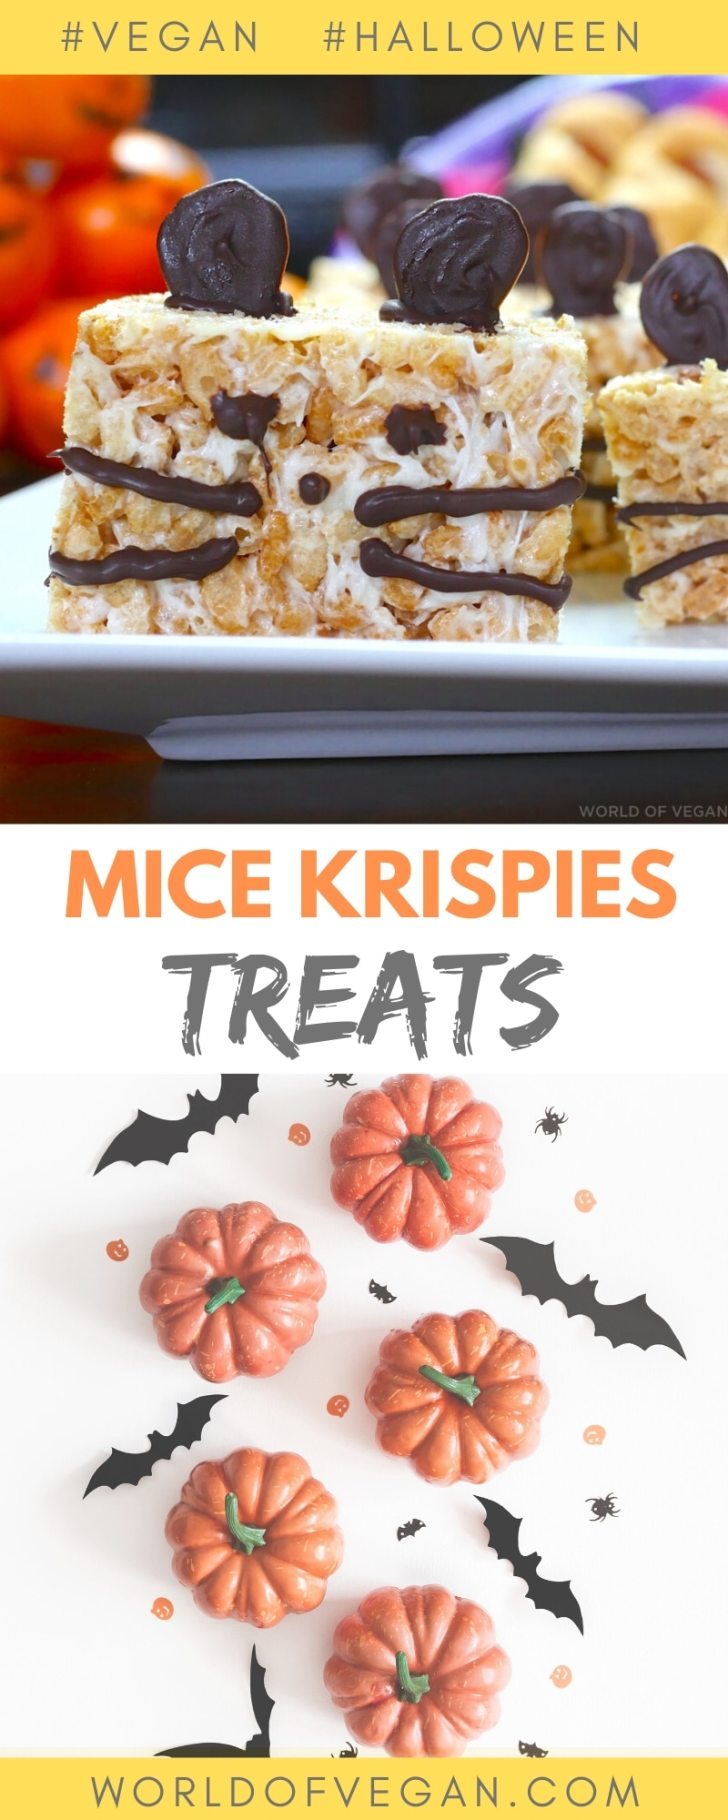 Halloween Mice Krispies Vegan Treats | World of Vegan | #vegan #halloween #treats #rice #krispies #mice #worldofvegan